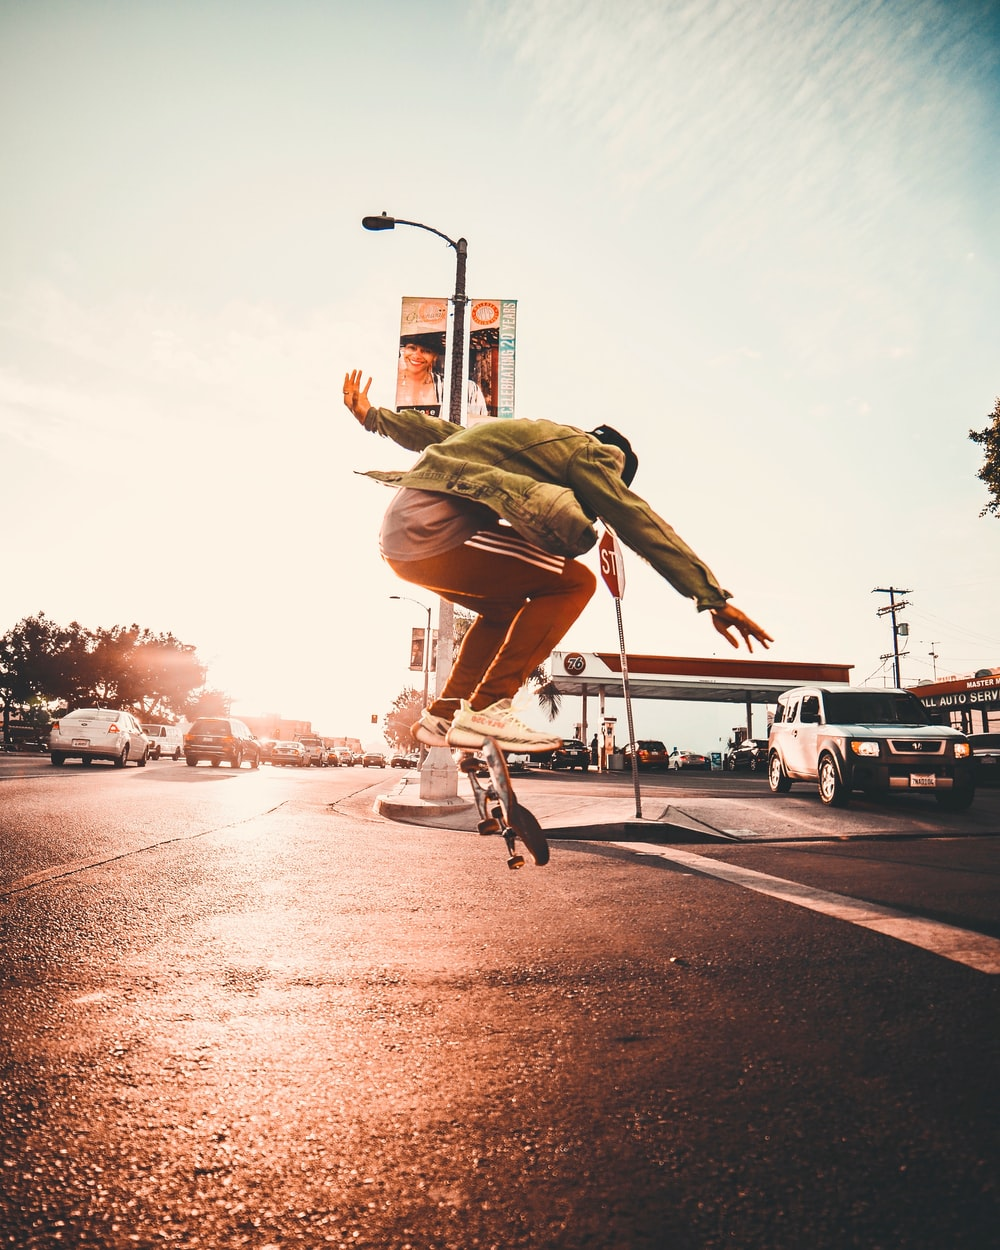 man doing skateboard trick